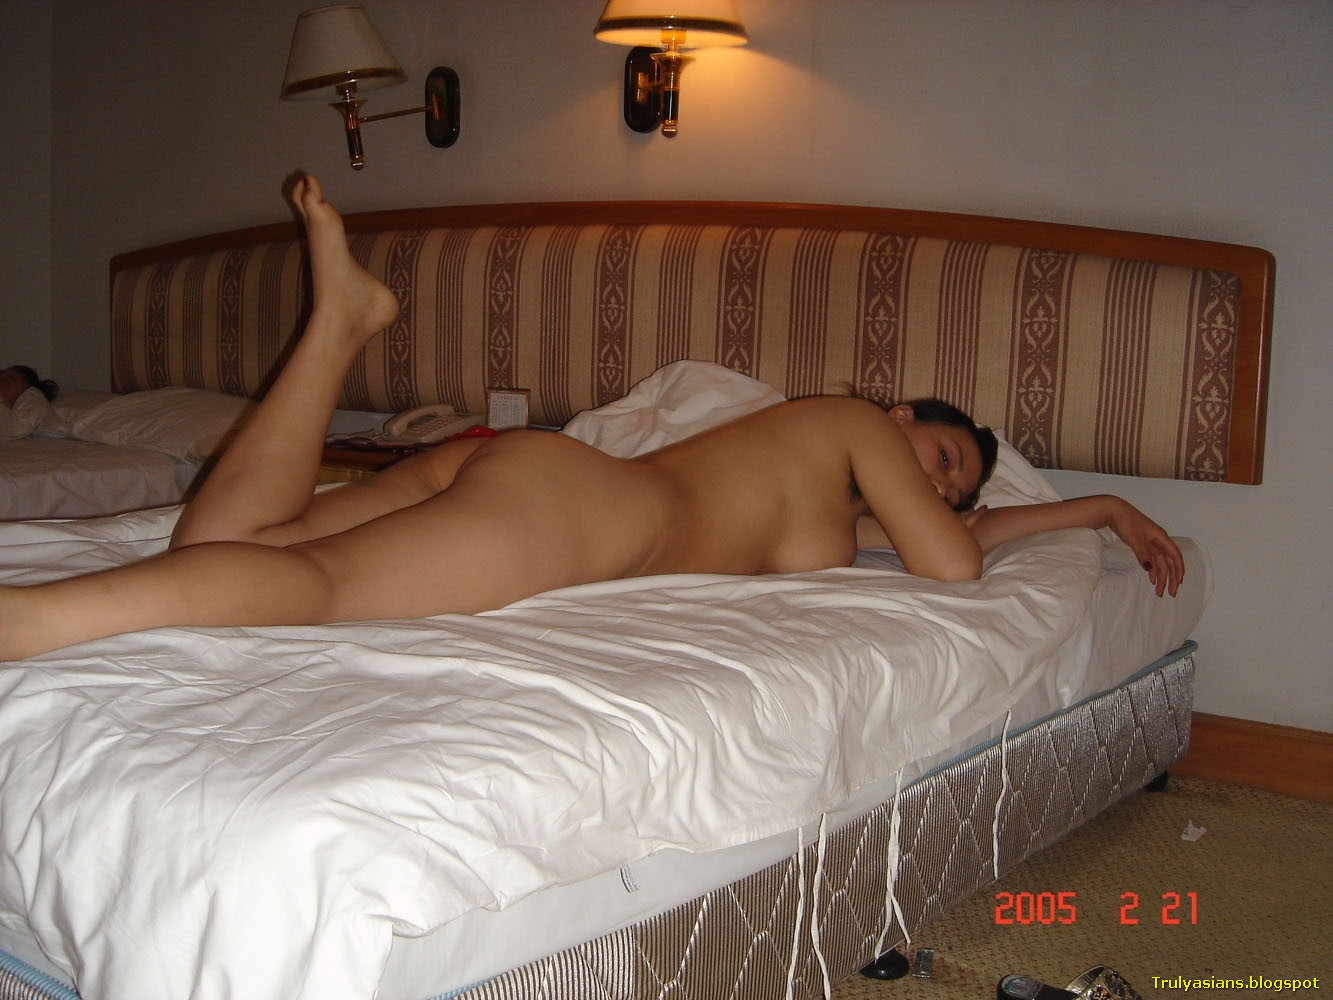 Hotel sex with busty cheater fernanda 6